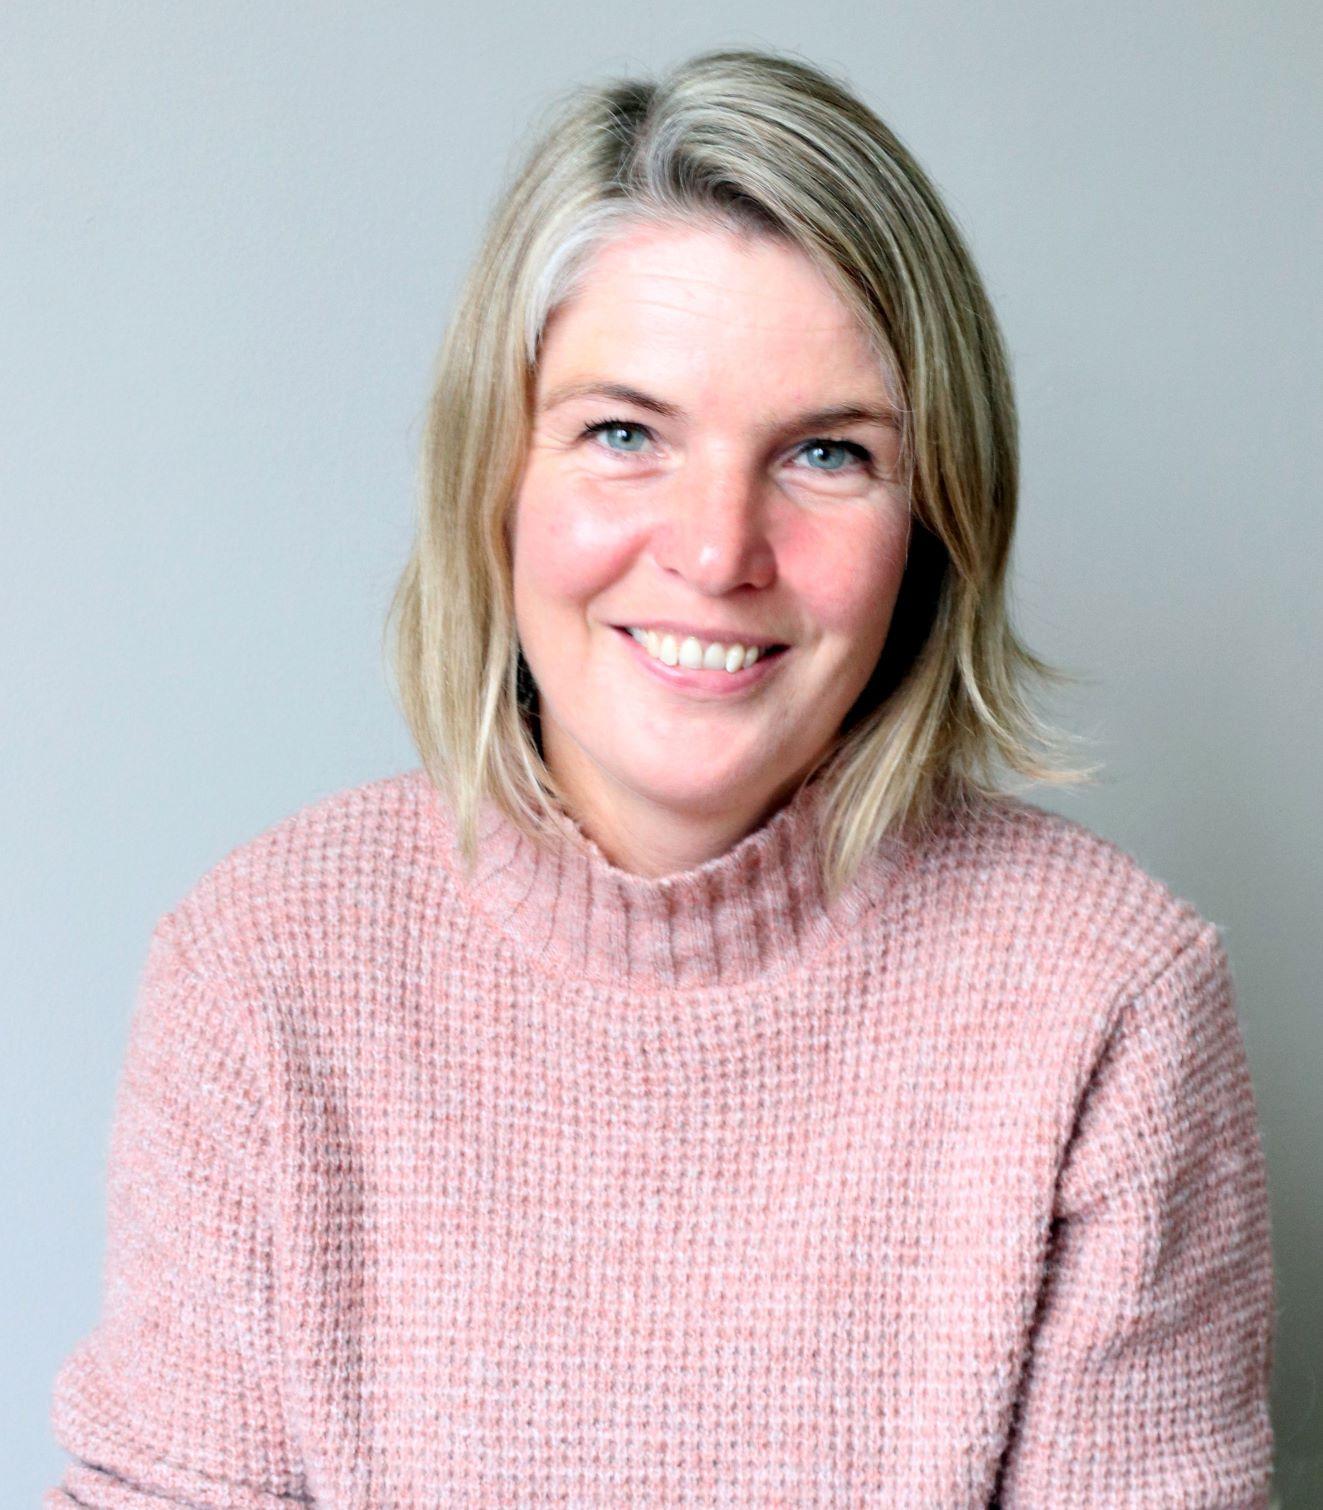 Praktijk Astrid Wessels voor healing, reading of coaching